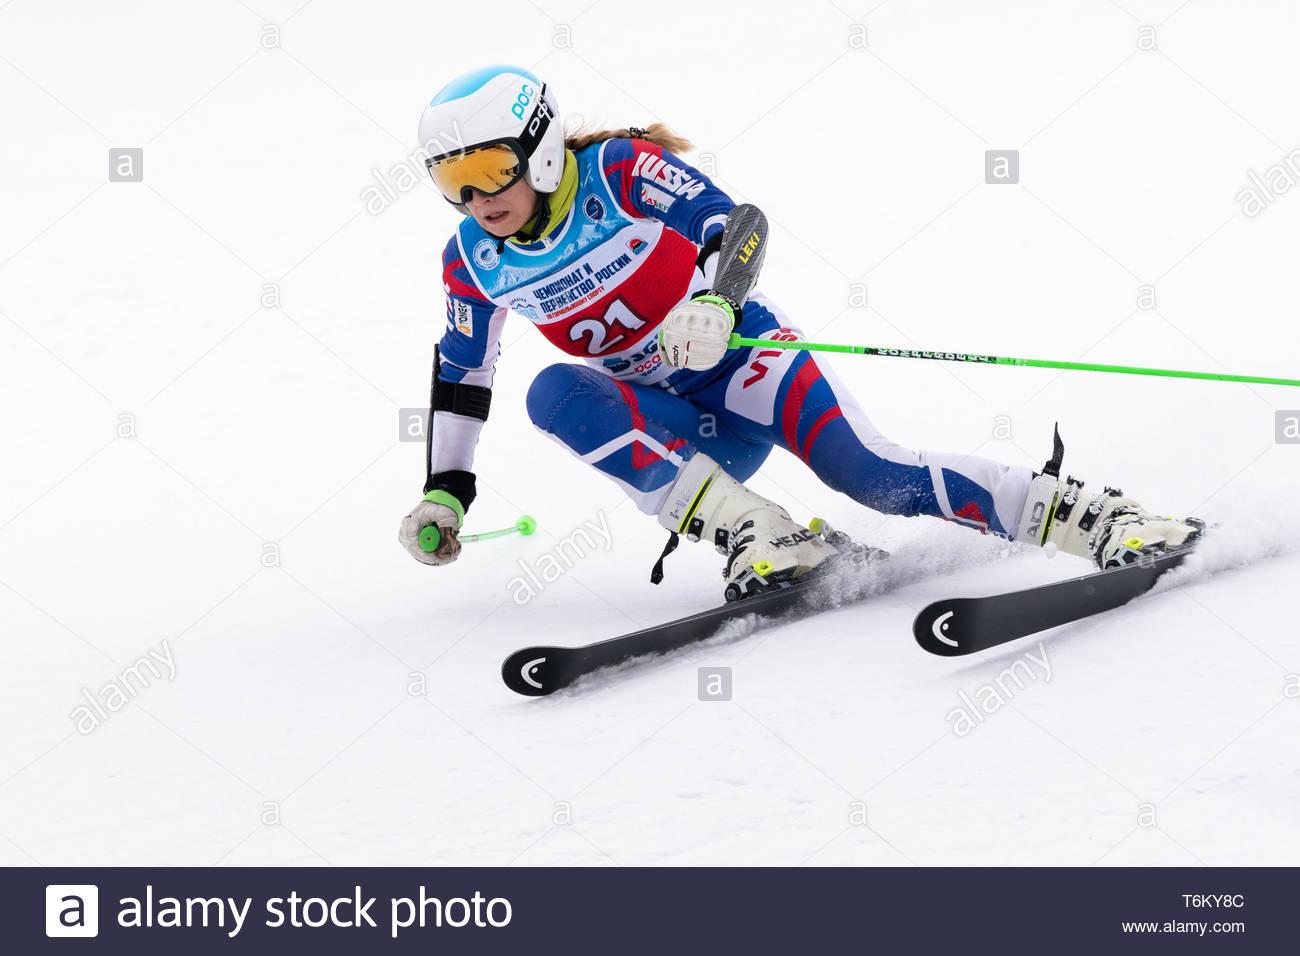 KAMCHATKA PENINSULA, RUSSIA - APRIL 2, 2019: Mountain skier Fedorova Ksenia (Moscow) skiing down mount. Russian Women's Alpine Skiing Cup, Internation - Stock Image